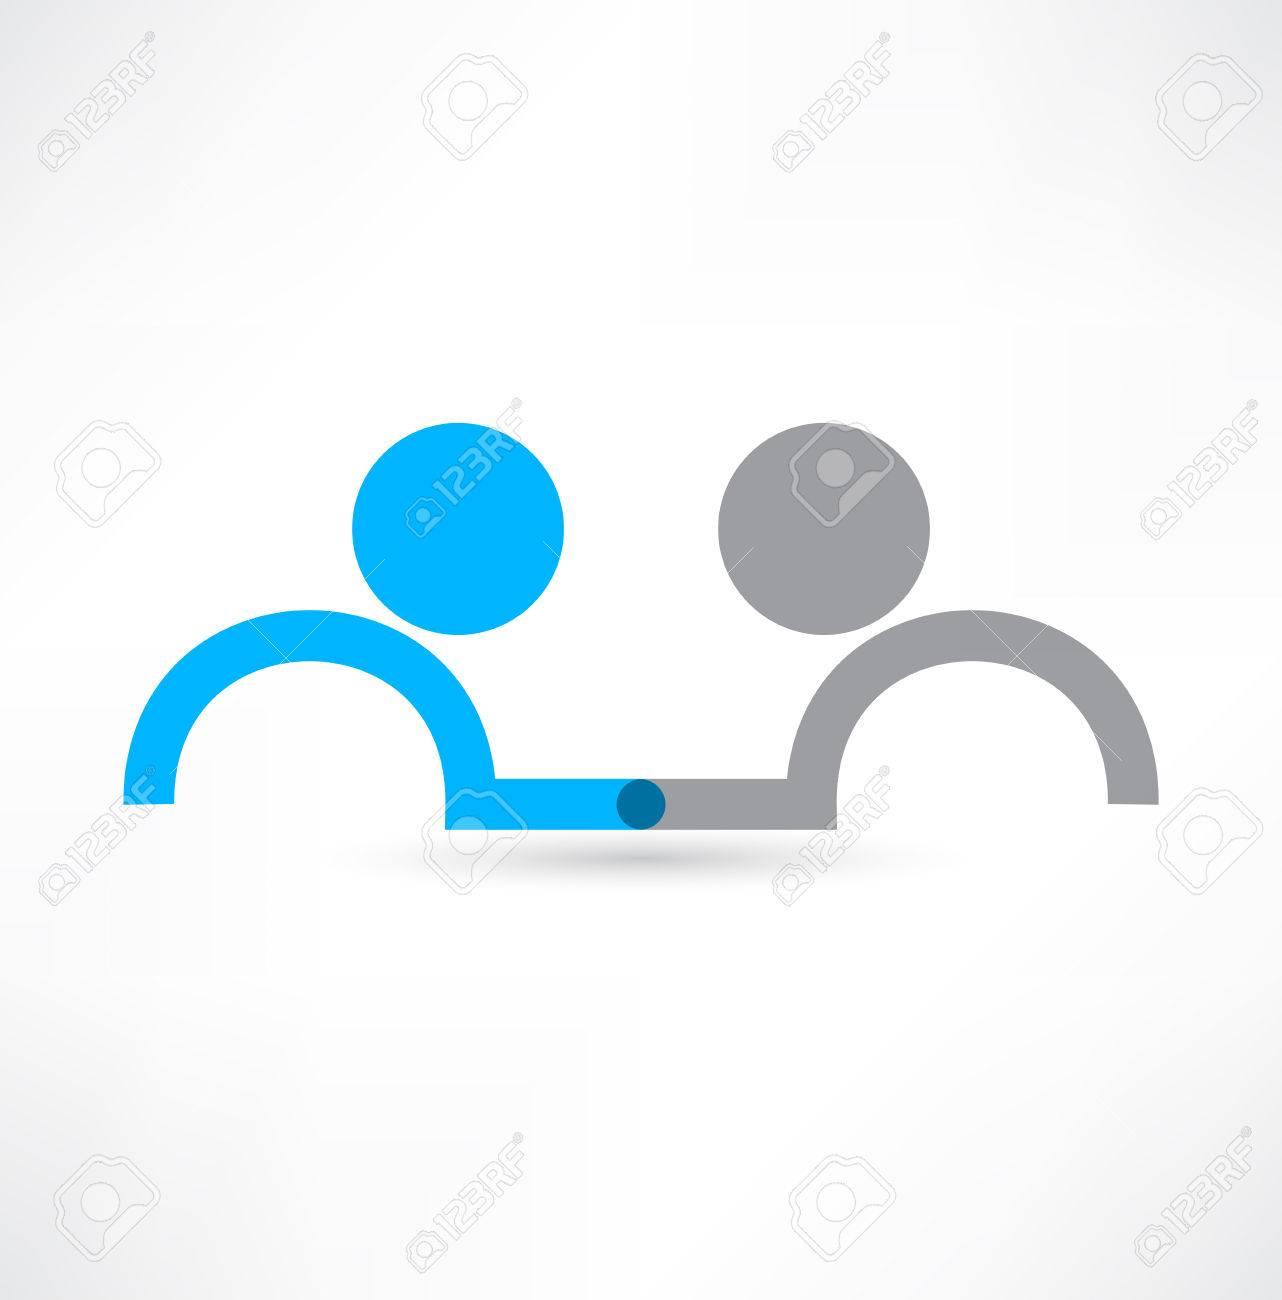 Handshake icon. Logo design. - 33673509